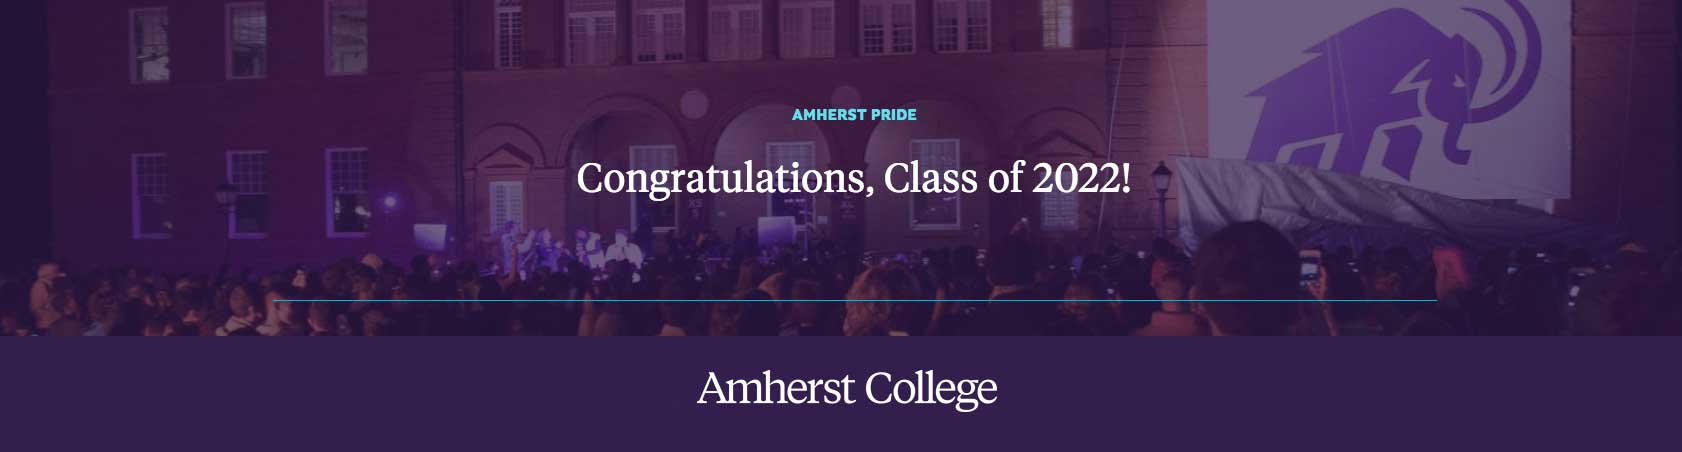 Congratulations, Class of 2022!